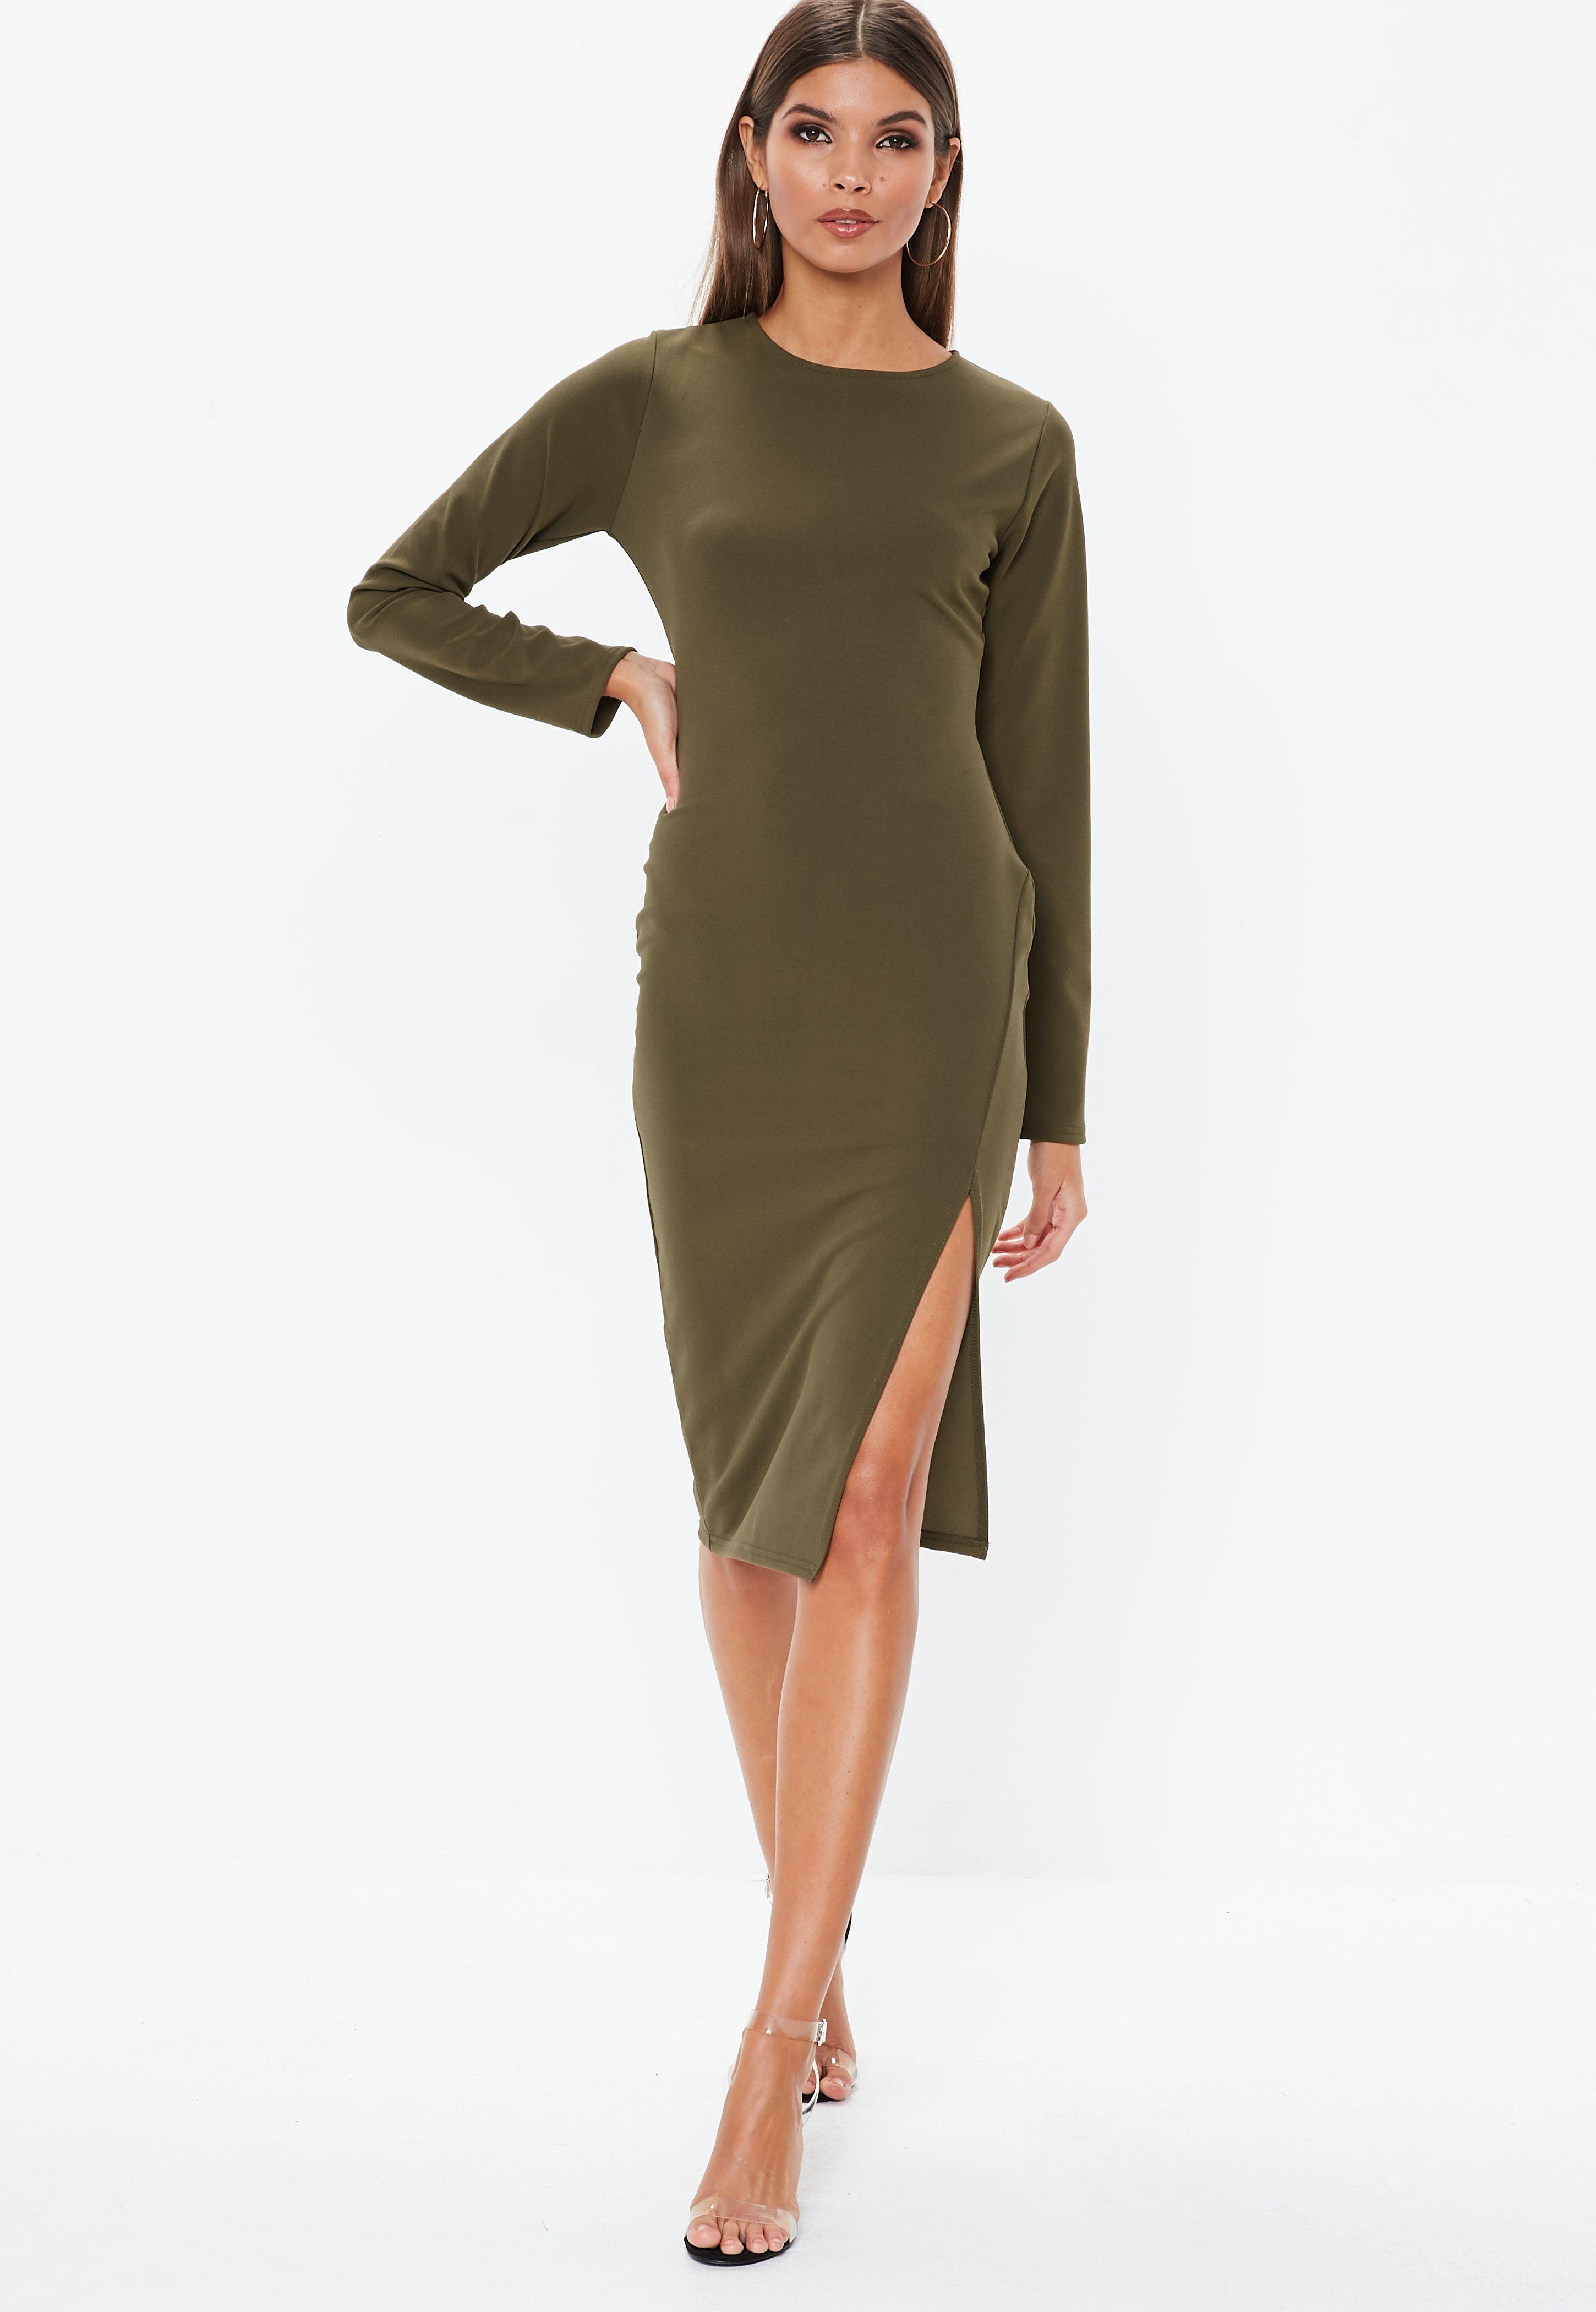 02fc6ca11b Khaki Dresses   Khaki Green Dresses - Missguided